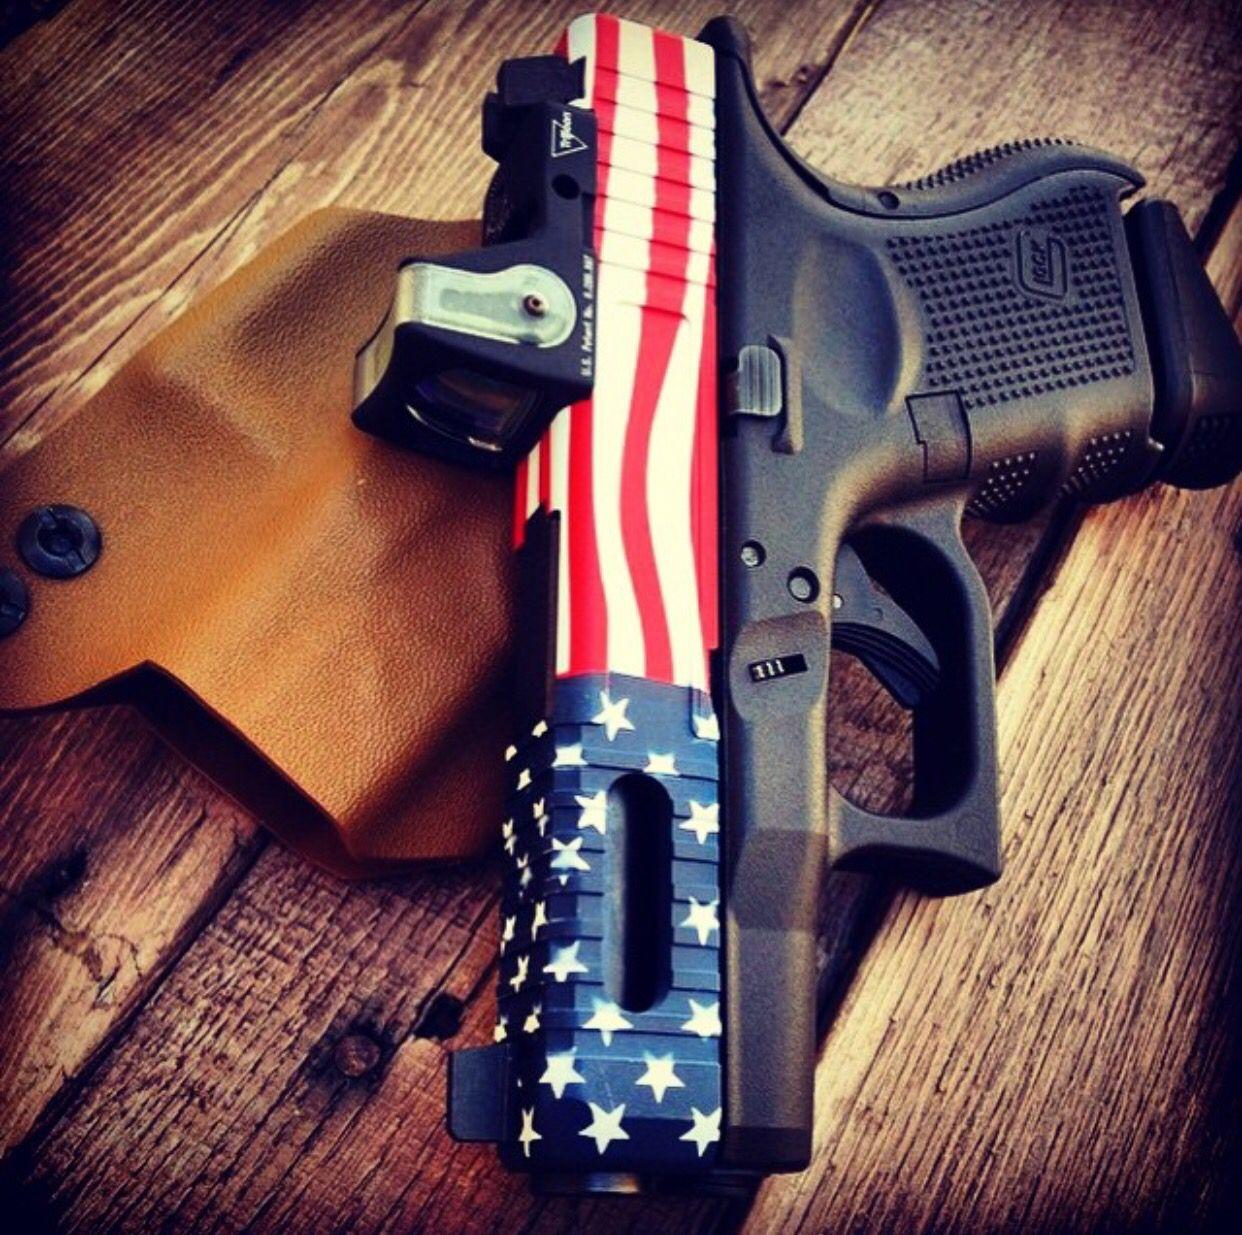 AMERICAN FLAG GLOCK Cool Guns, Revolver, Camouflage, 2nd Amendment, Pistol  For Women 6c8ce22d1ba